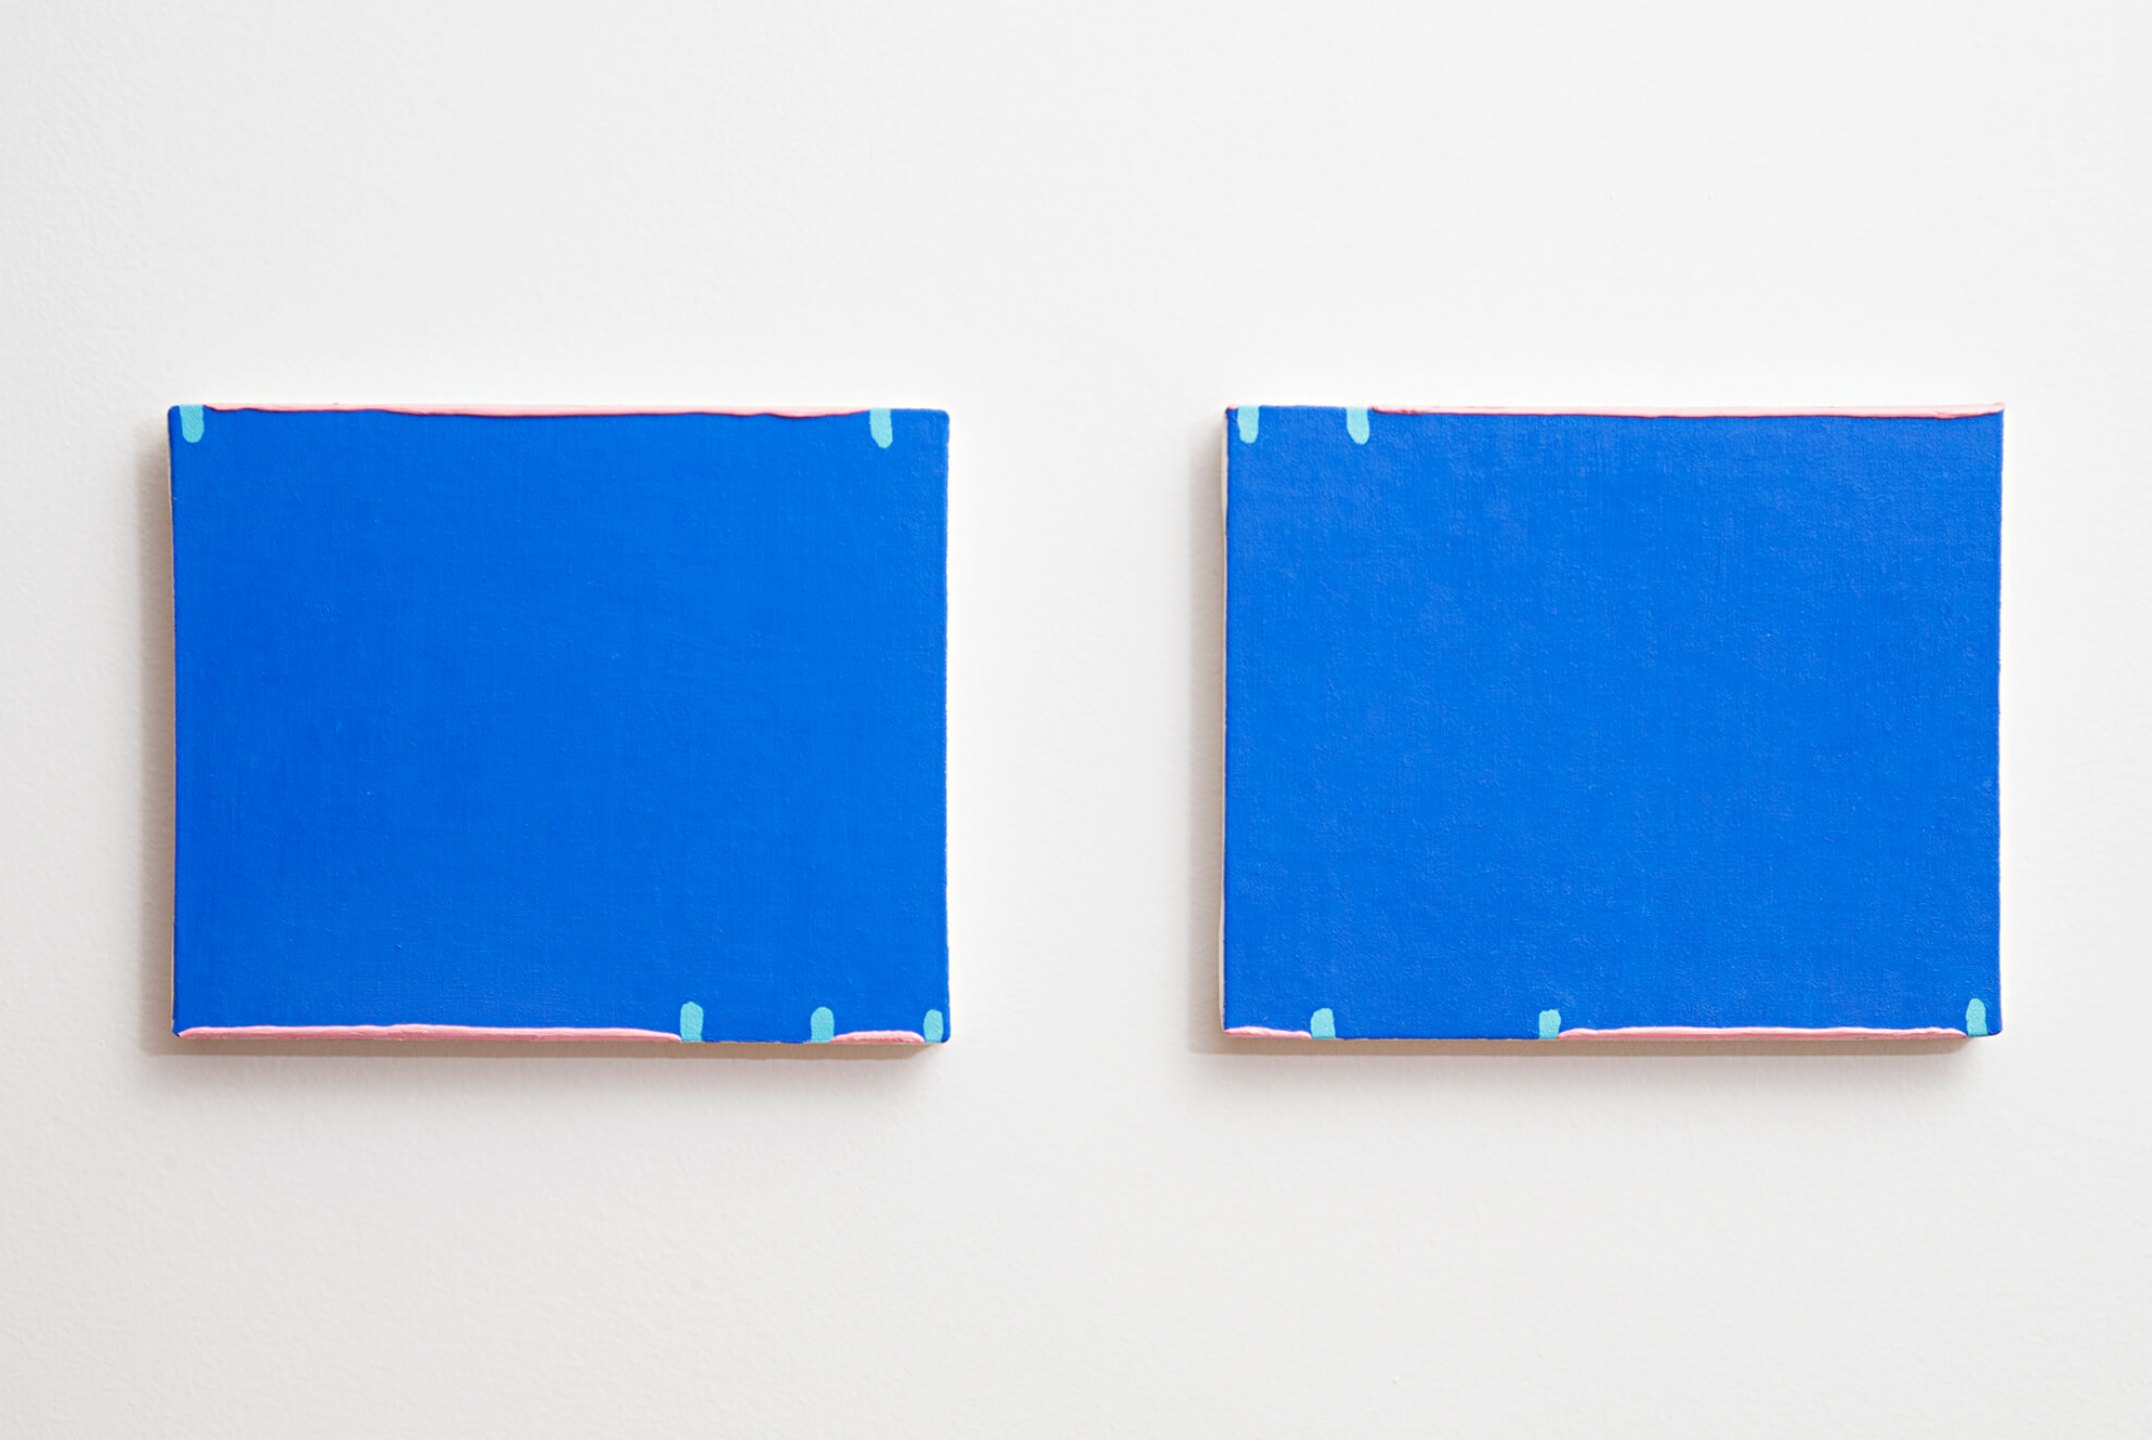 Paulo Monteiro, <em>untitled,</em> 2013, oil on canvas, 20×25 cm (each) - Mendes Wood DM